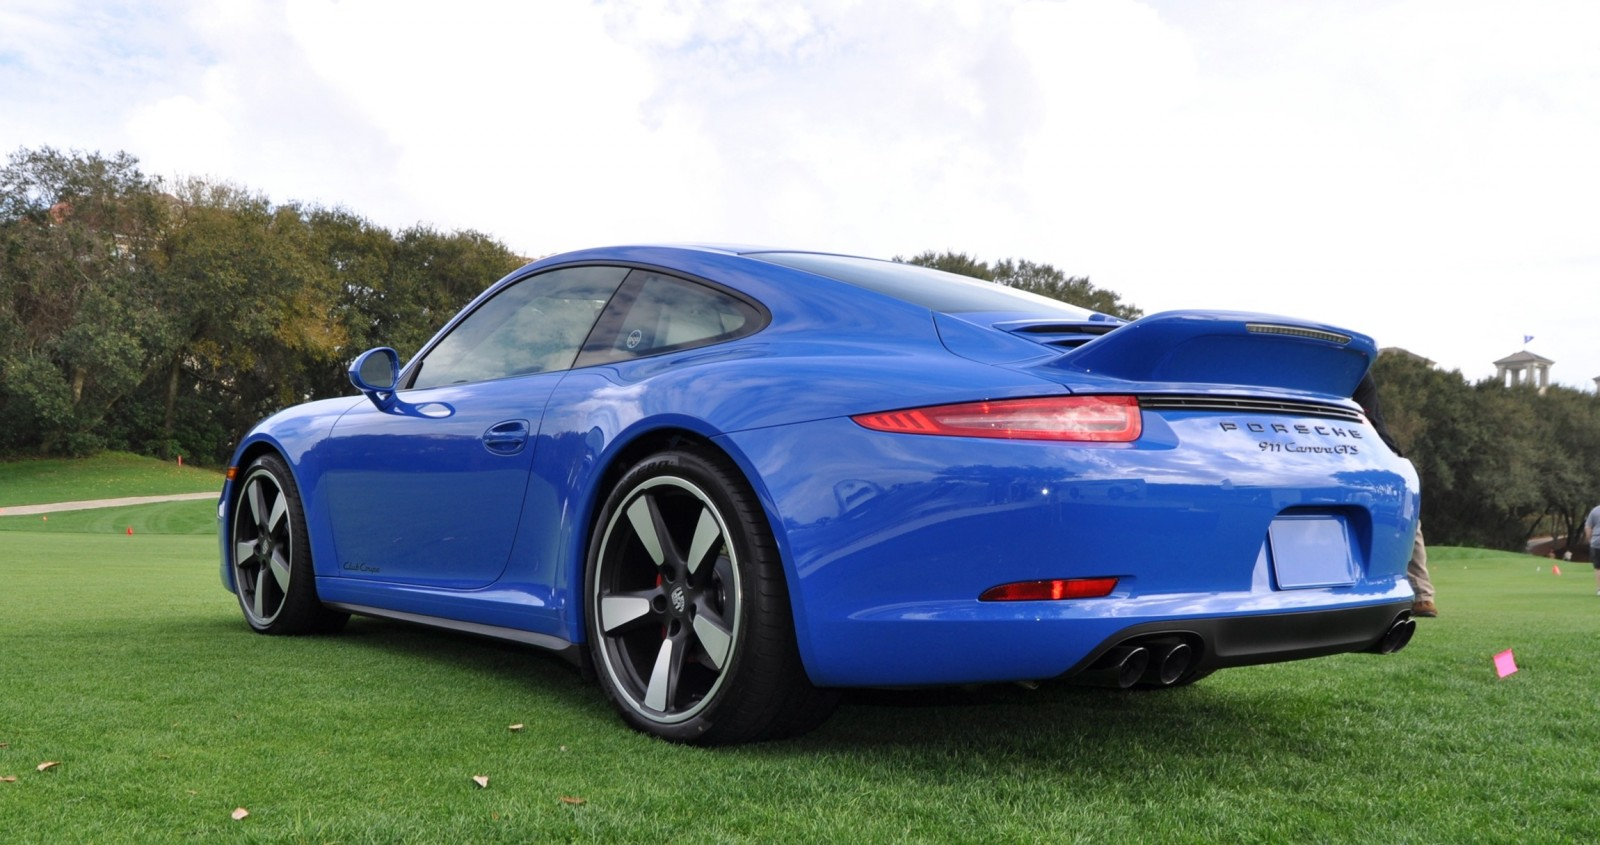 2015 Porsche 911 GTS Club Coupe USA